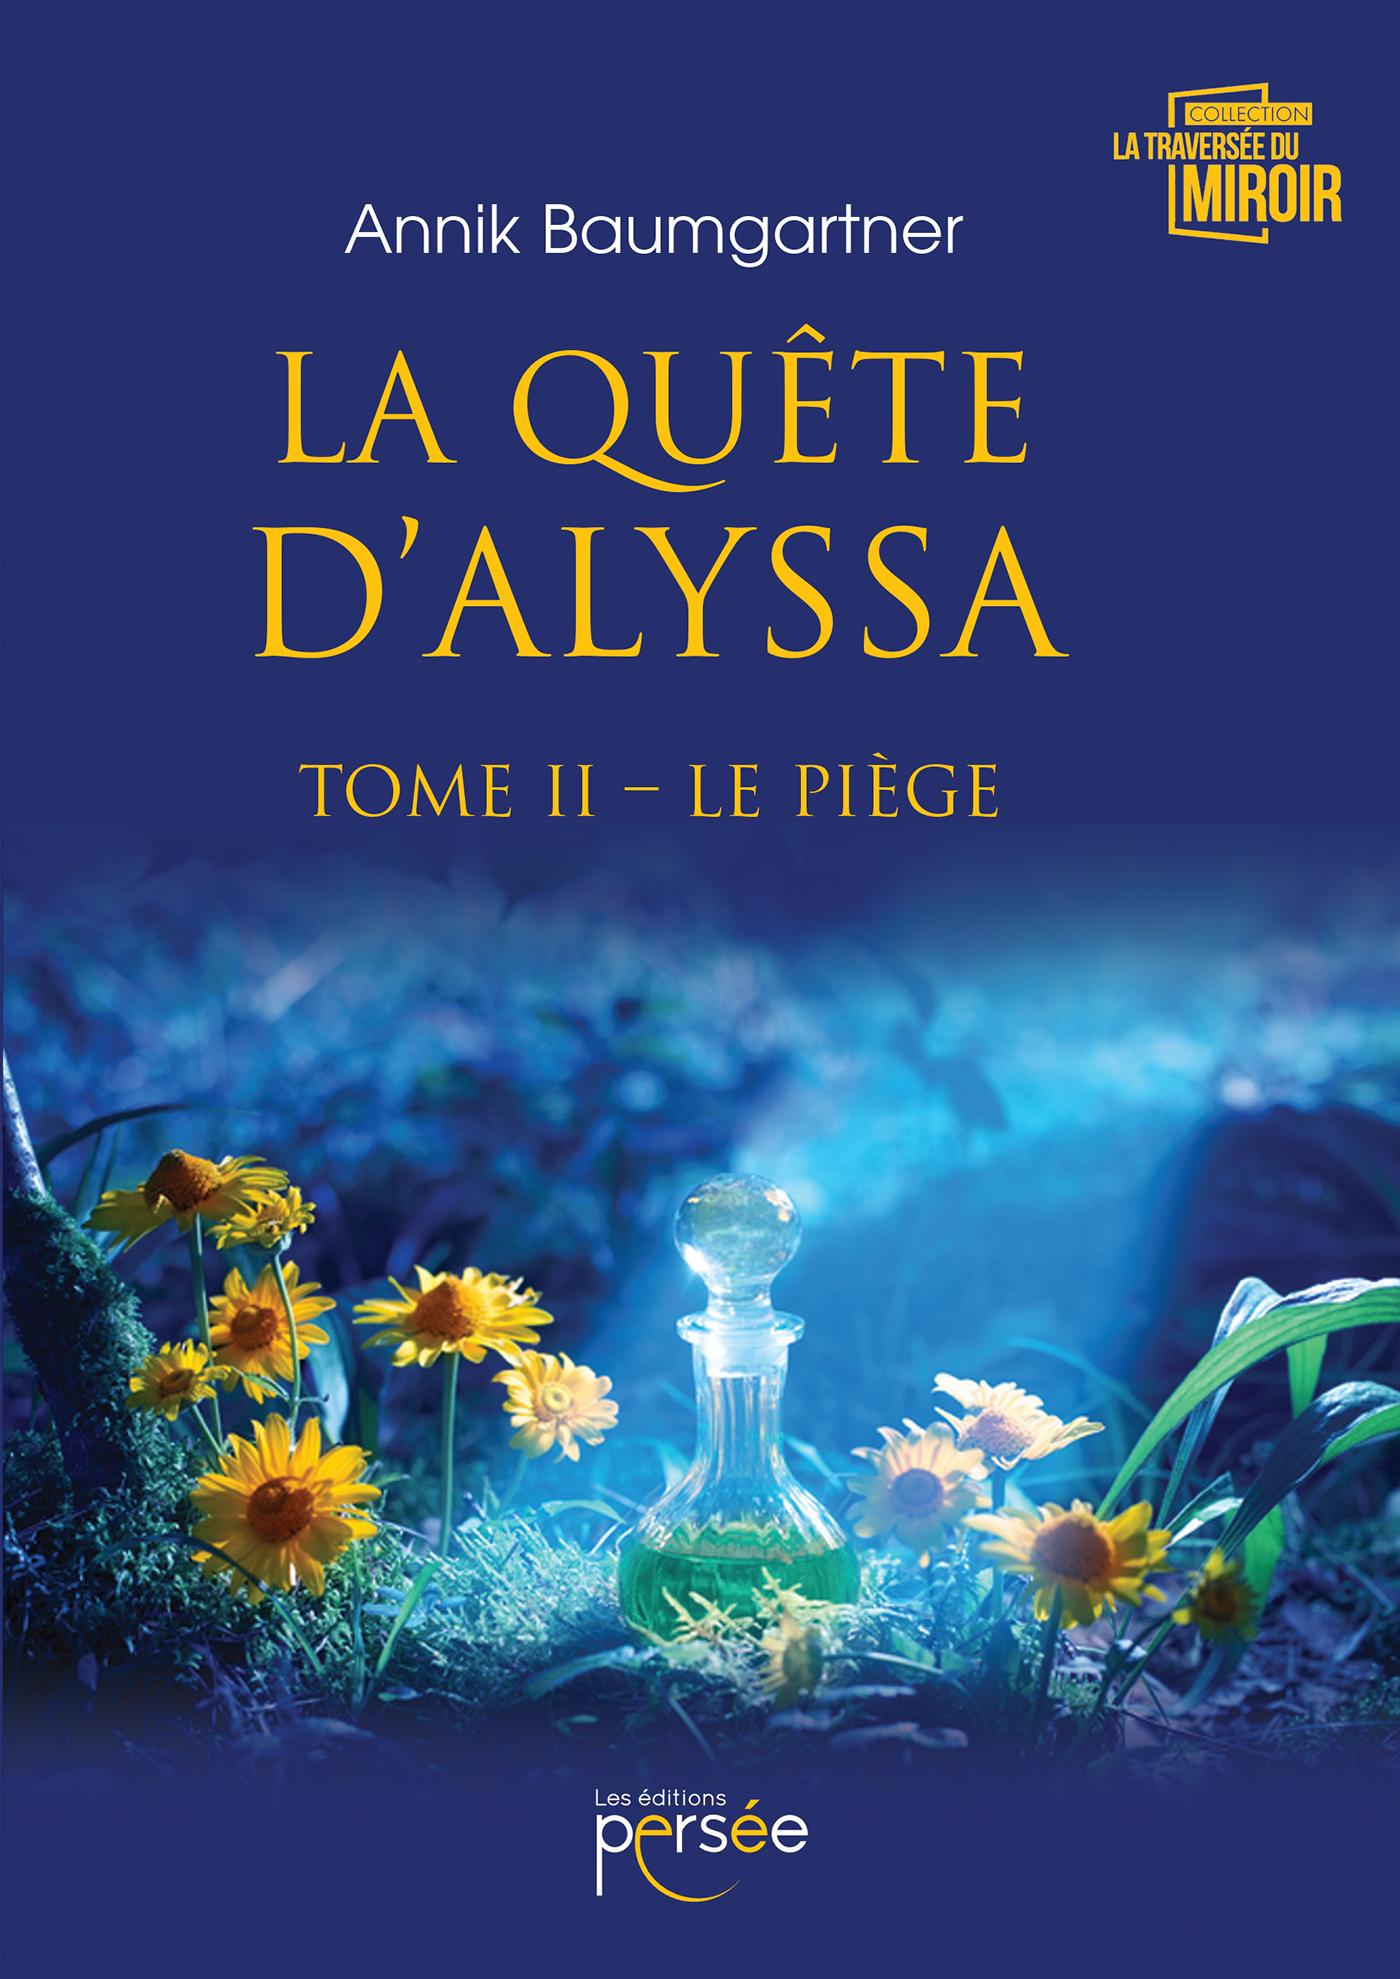 La quête d'Alyssa – Tome 2